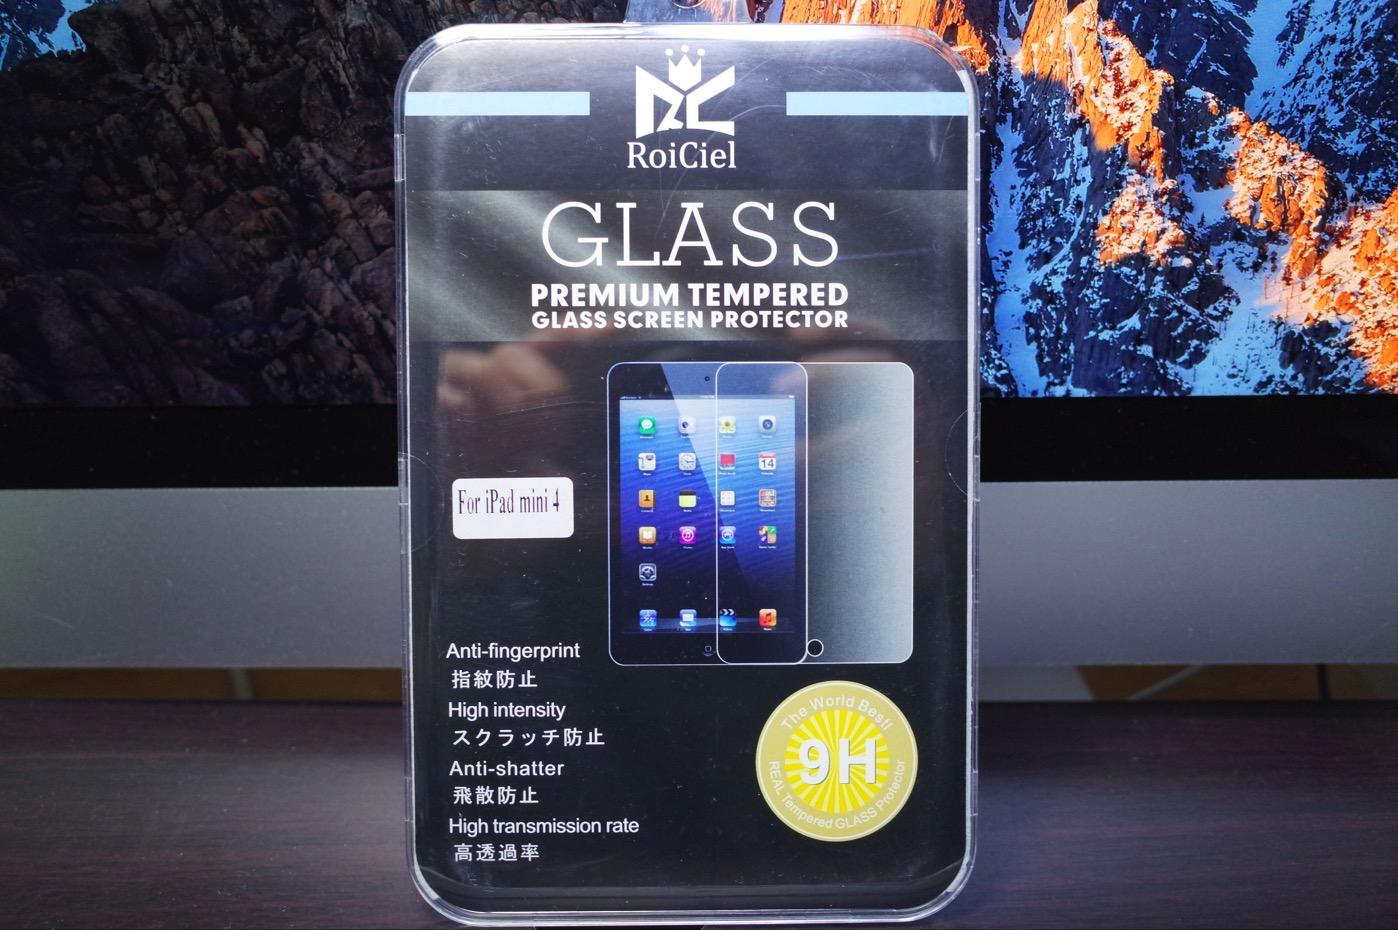 RoiCeil 液晶保護強化ガラスフィルム 硬度9H 超薄0.3mm 2.5D ラウンドエッジ加工-1